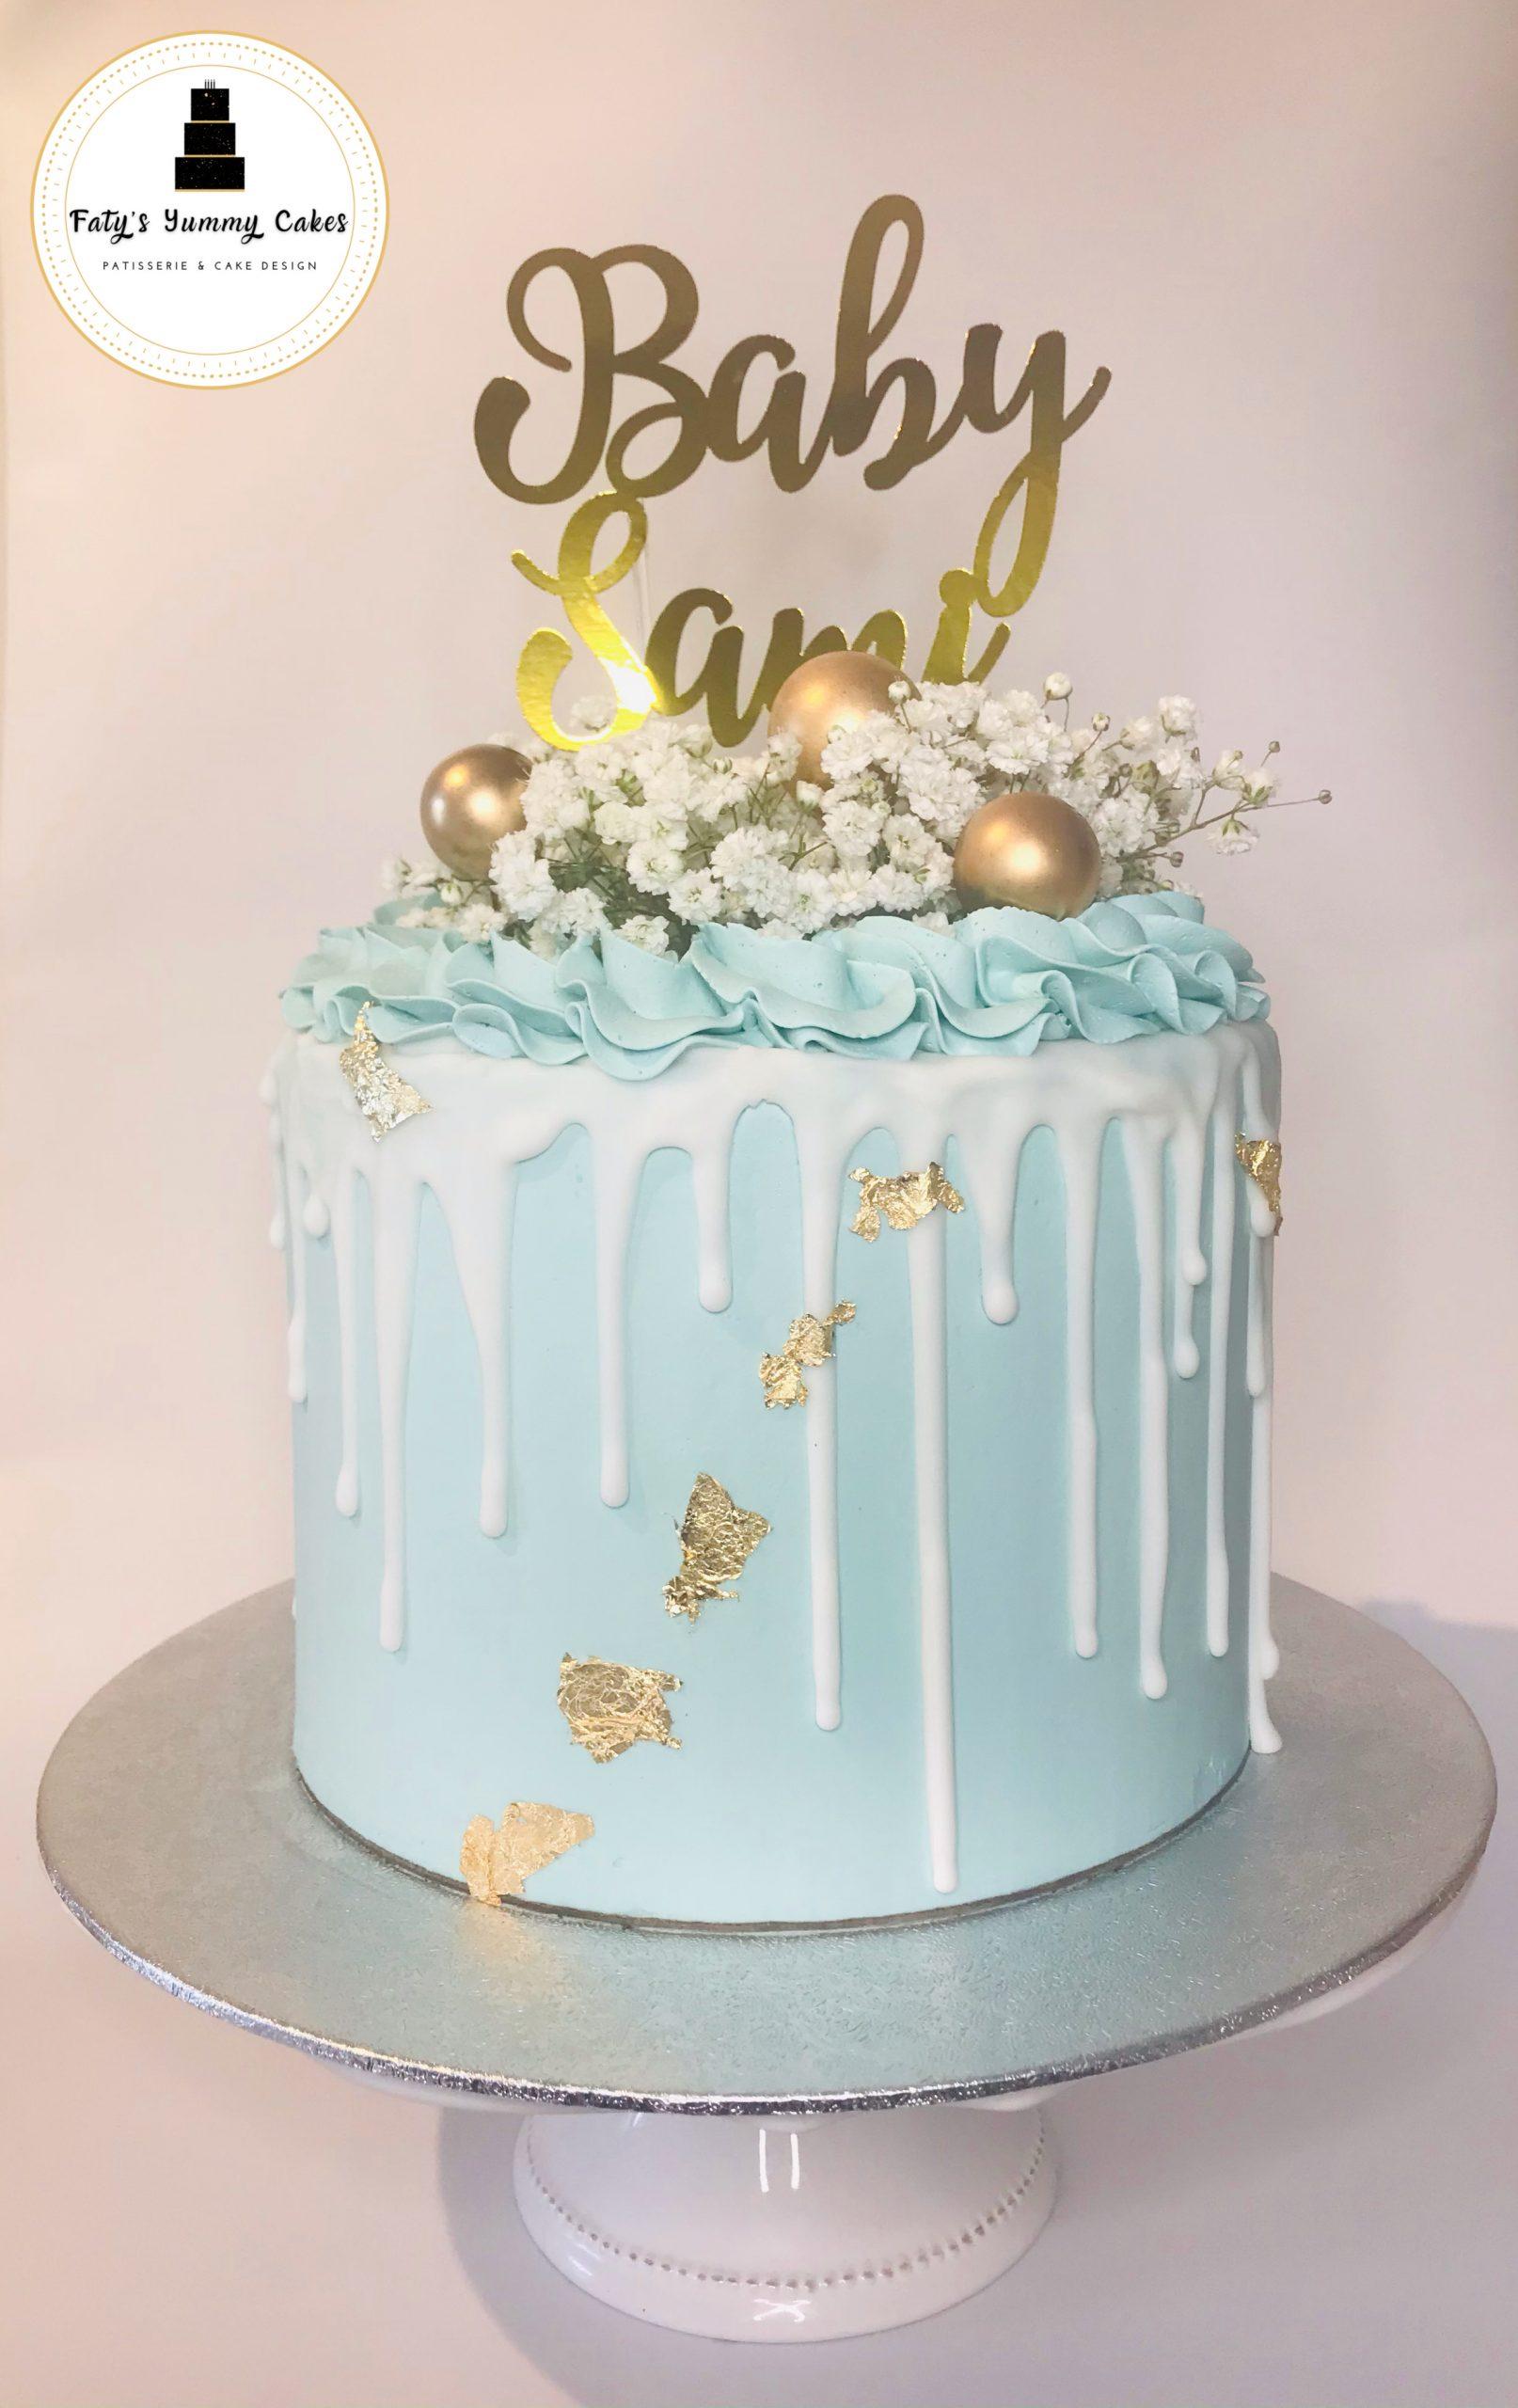 Atelier Layer Cake by Faty's Yummy Cakes